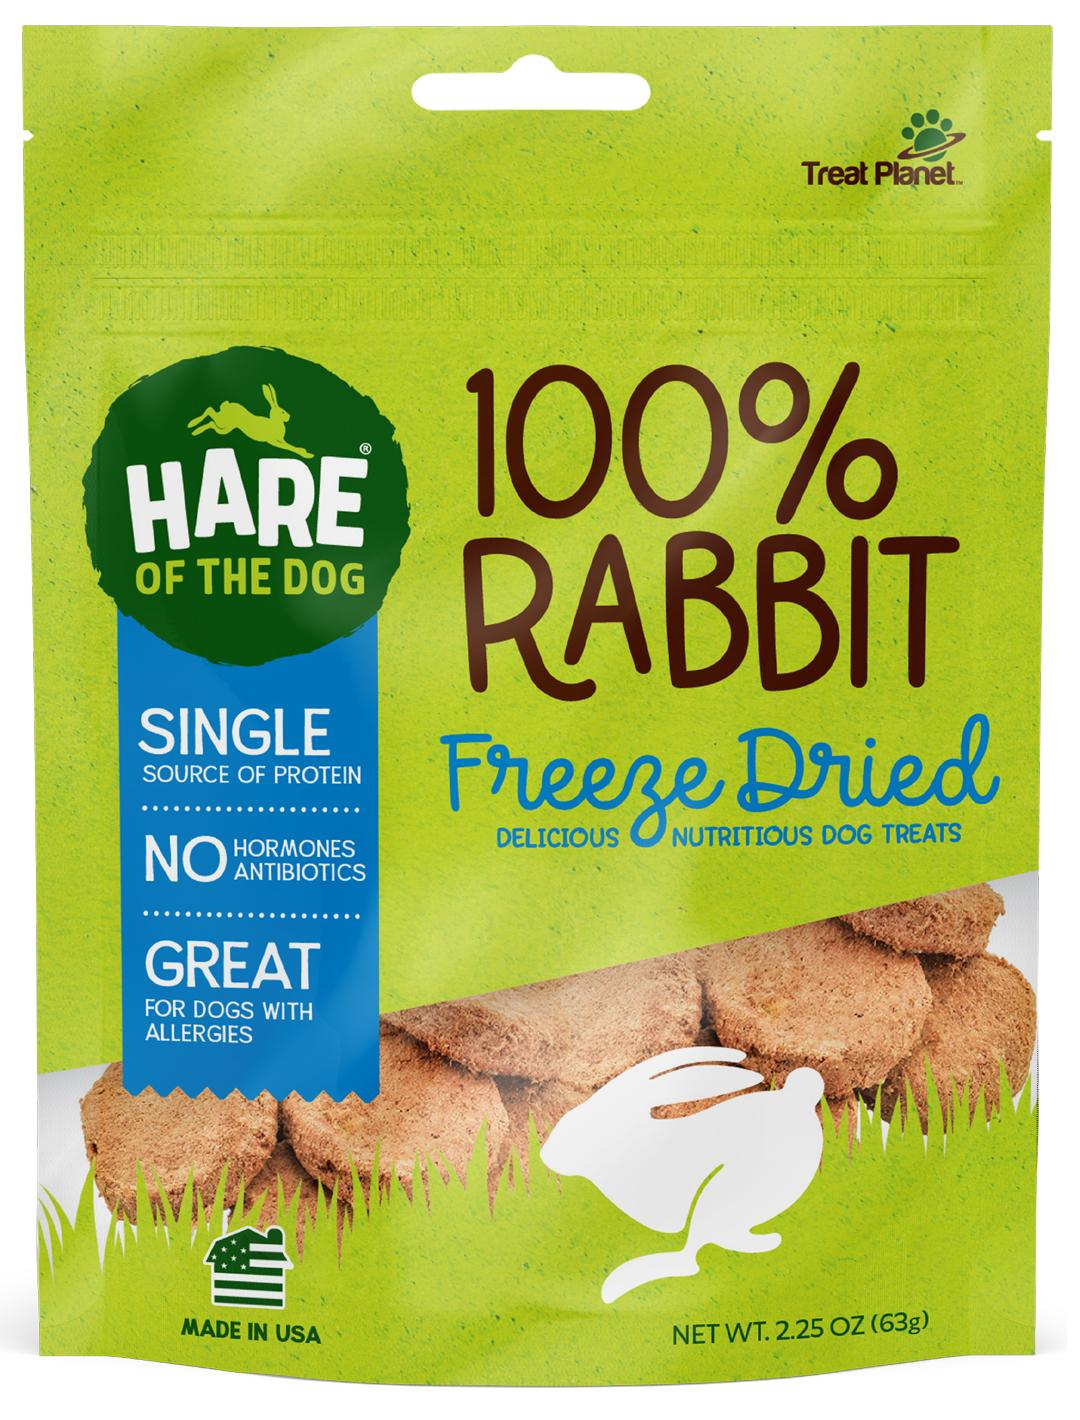 Hare of the Dog 100% Rabbit Freeze-Dried Dog Treats, 2.25-oz